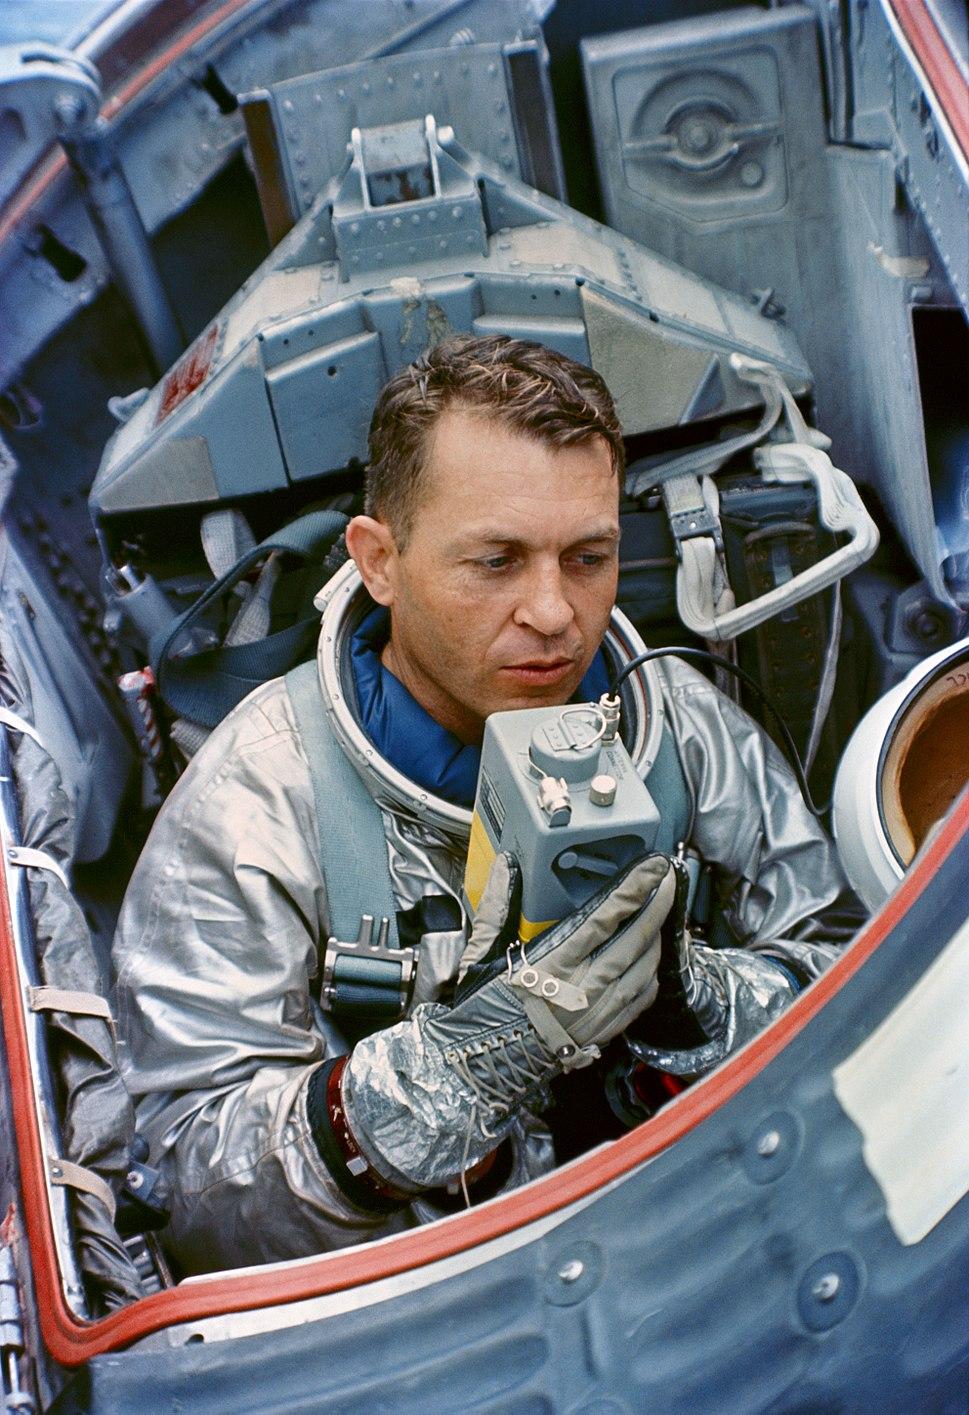 Gemini 5 Elliot See water egress training